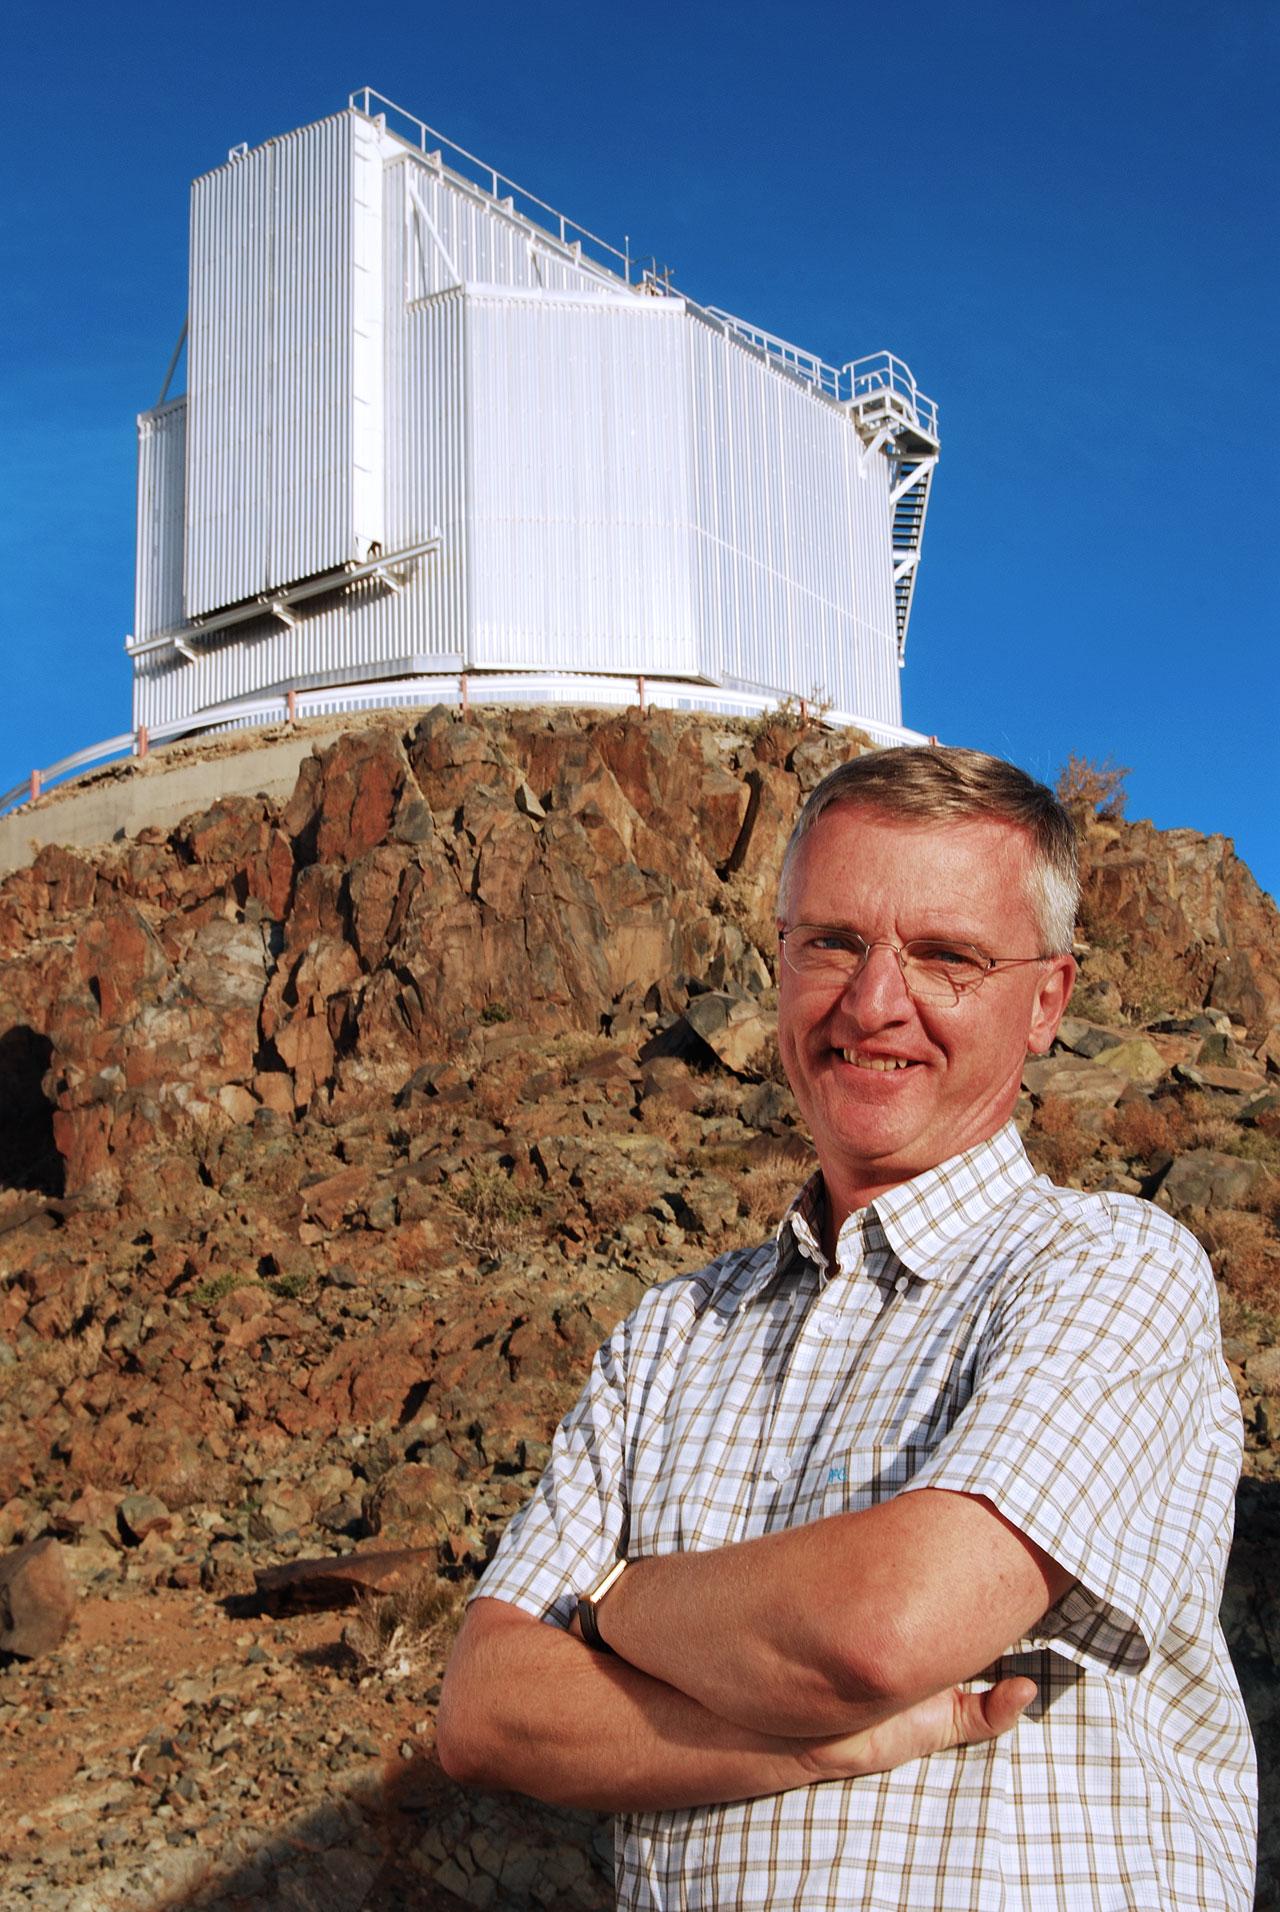 Prof. Tim de Zeeuw visiting La Silla